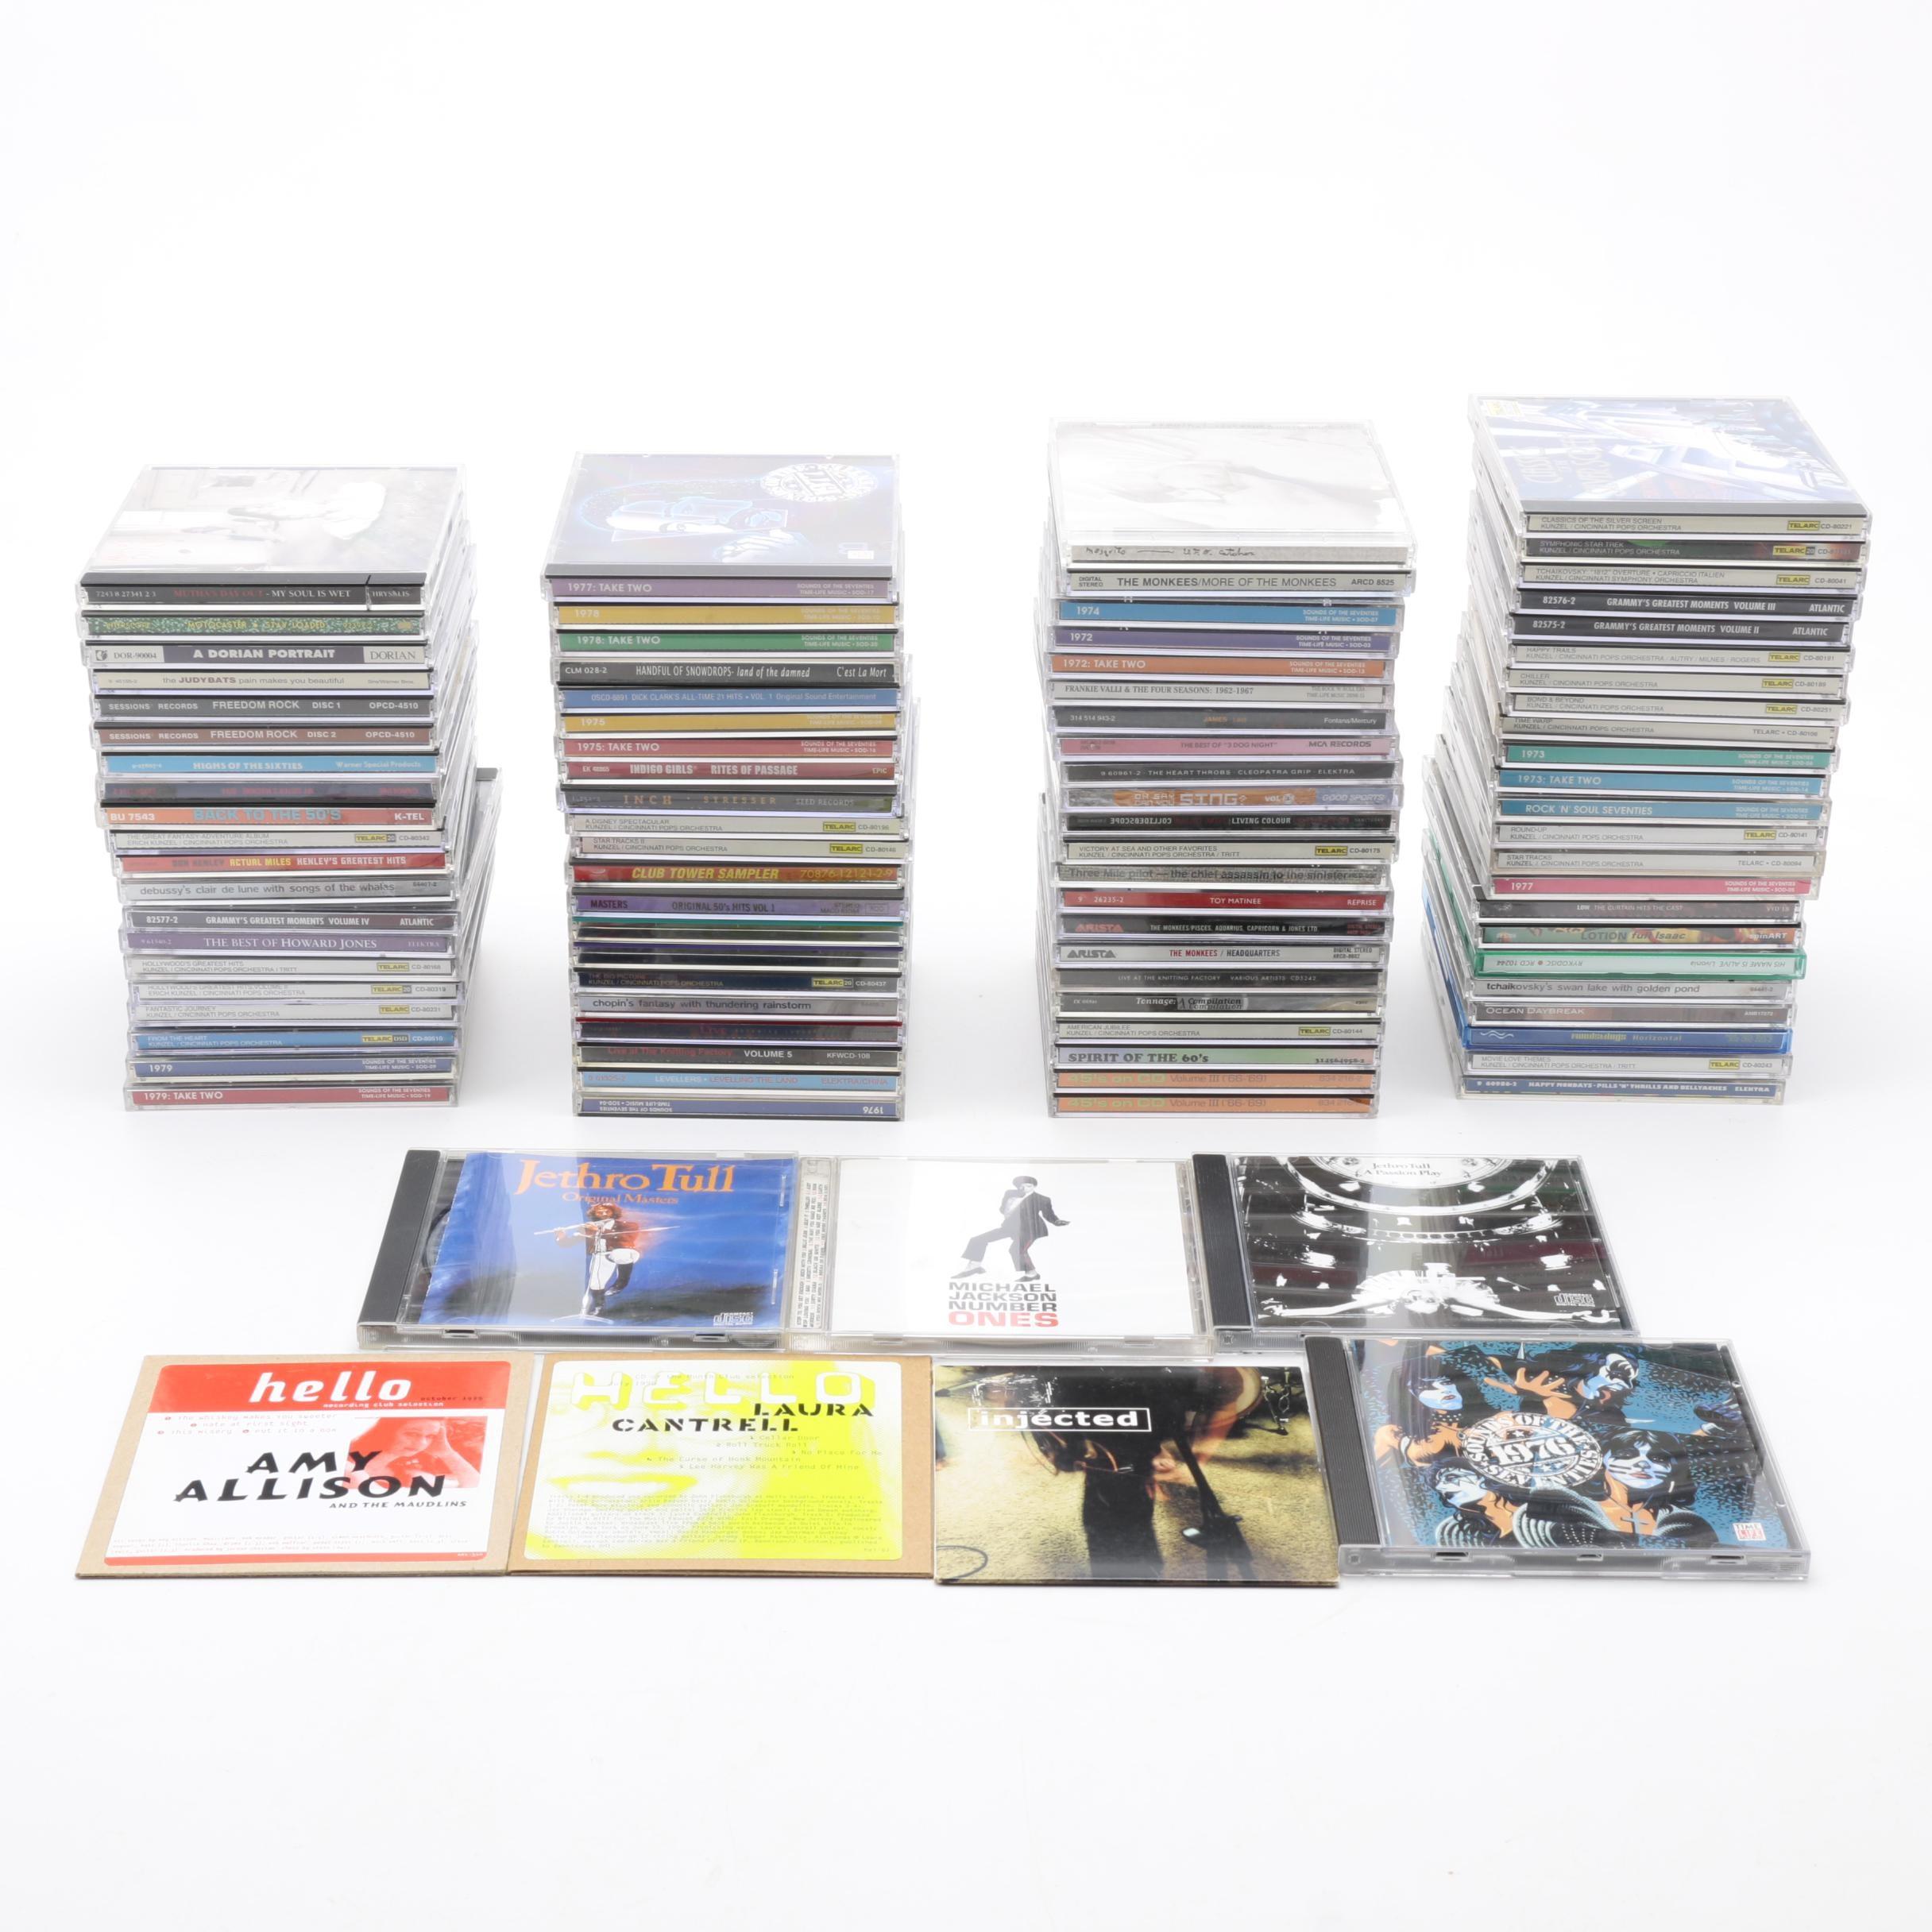 Large Assortment of CDs, including Elton John, Pink Floyd, and 24K Gold CDs